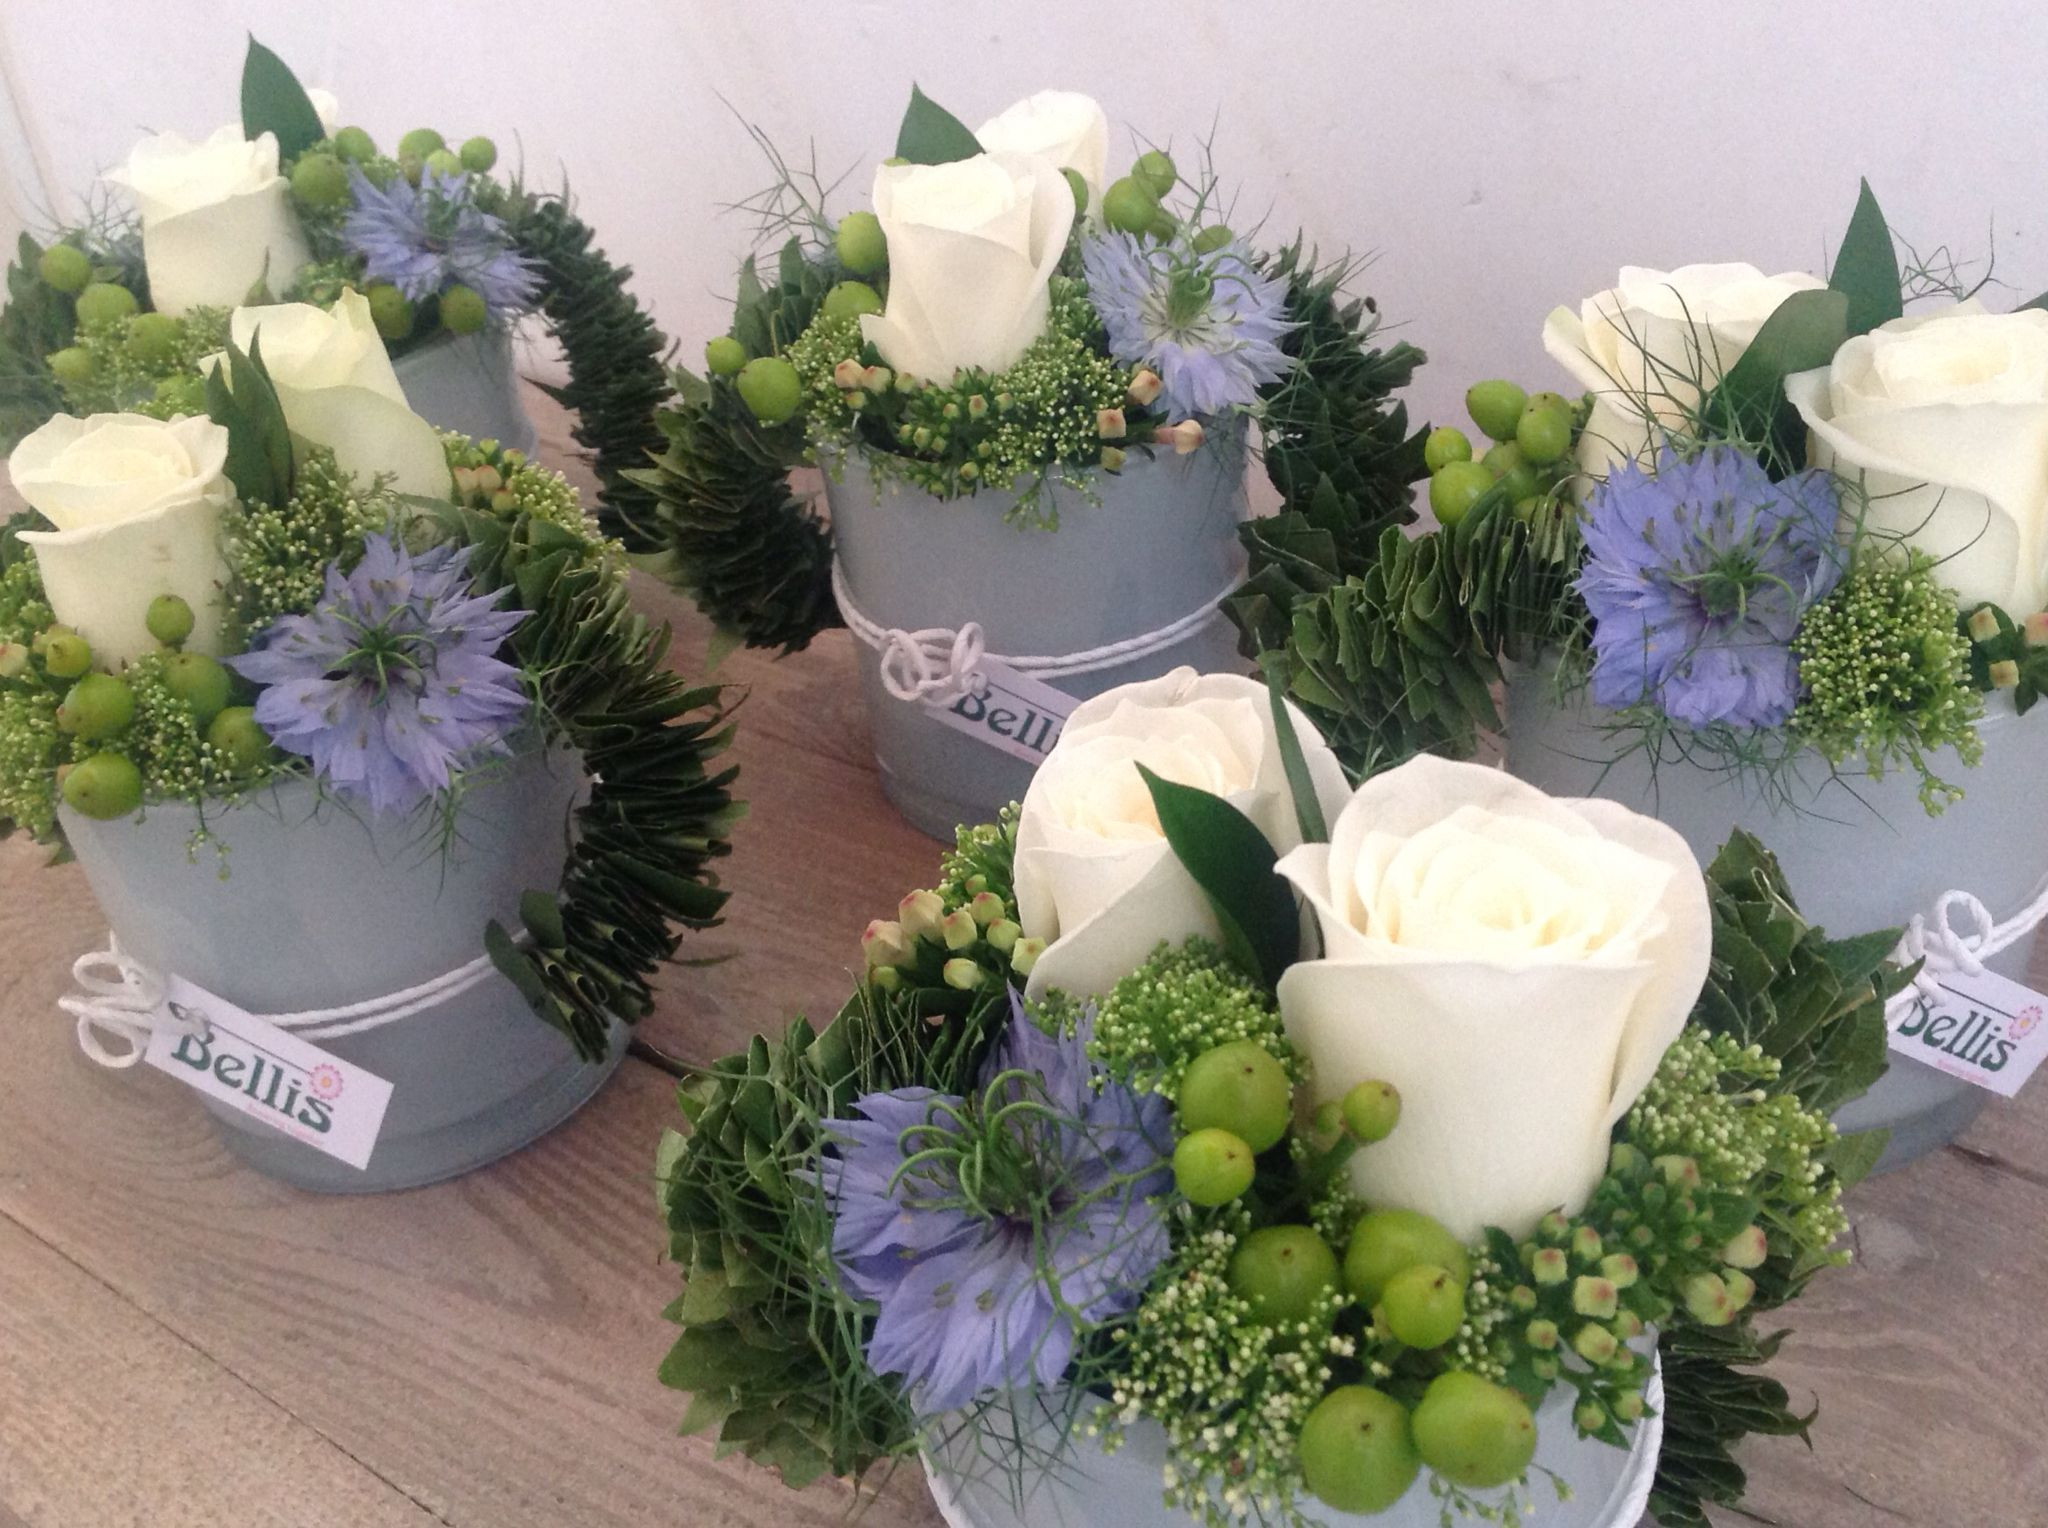 floral arrangements with fruit in vase of tafelstukjes communie virag doboz pinterest flowers flower for floral design a· fruit flowers a· small flowers a· tafelstukjes communie